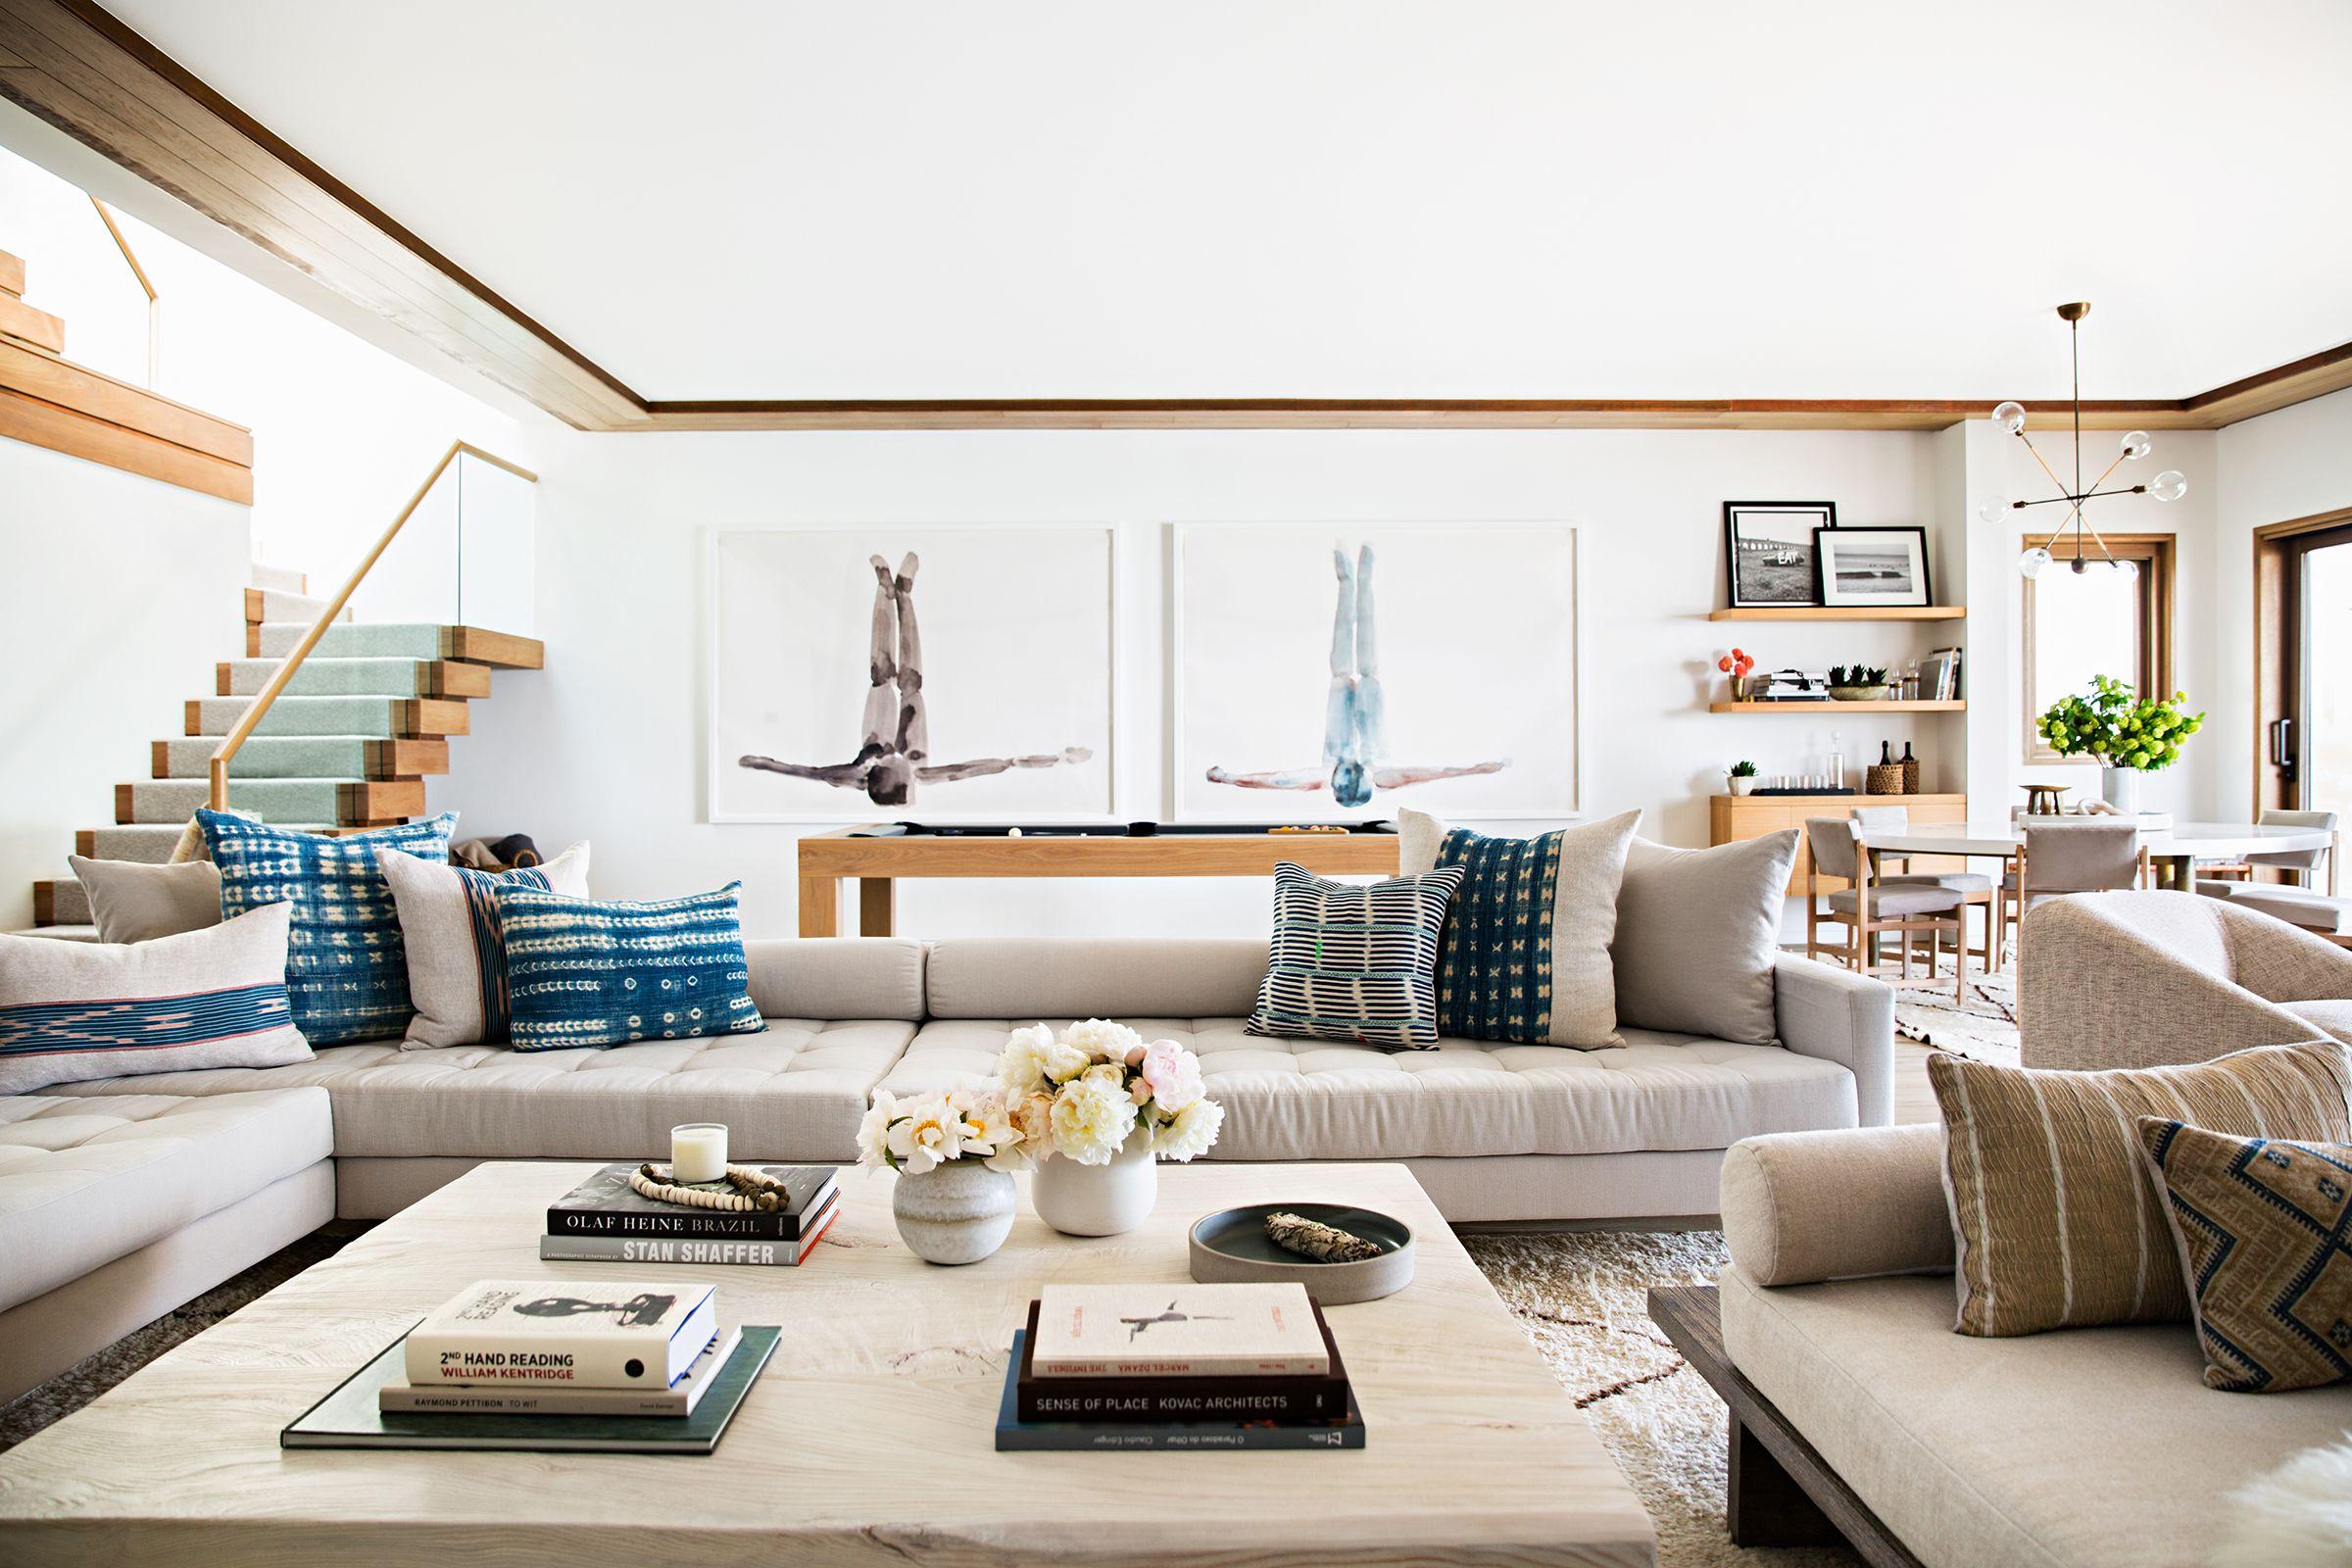 Super 18 Great Room Ideas Open Floor Plan Decorating Tips Machost Co Dining Chair Design Ideas Machostcouk